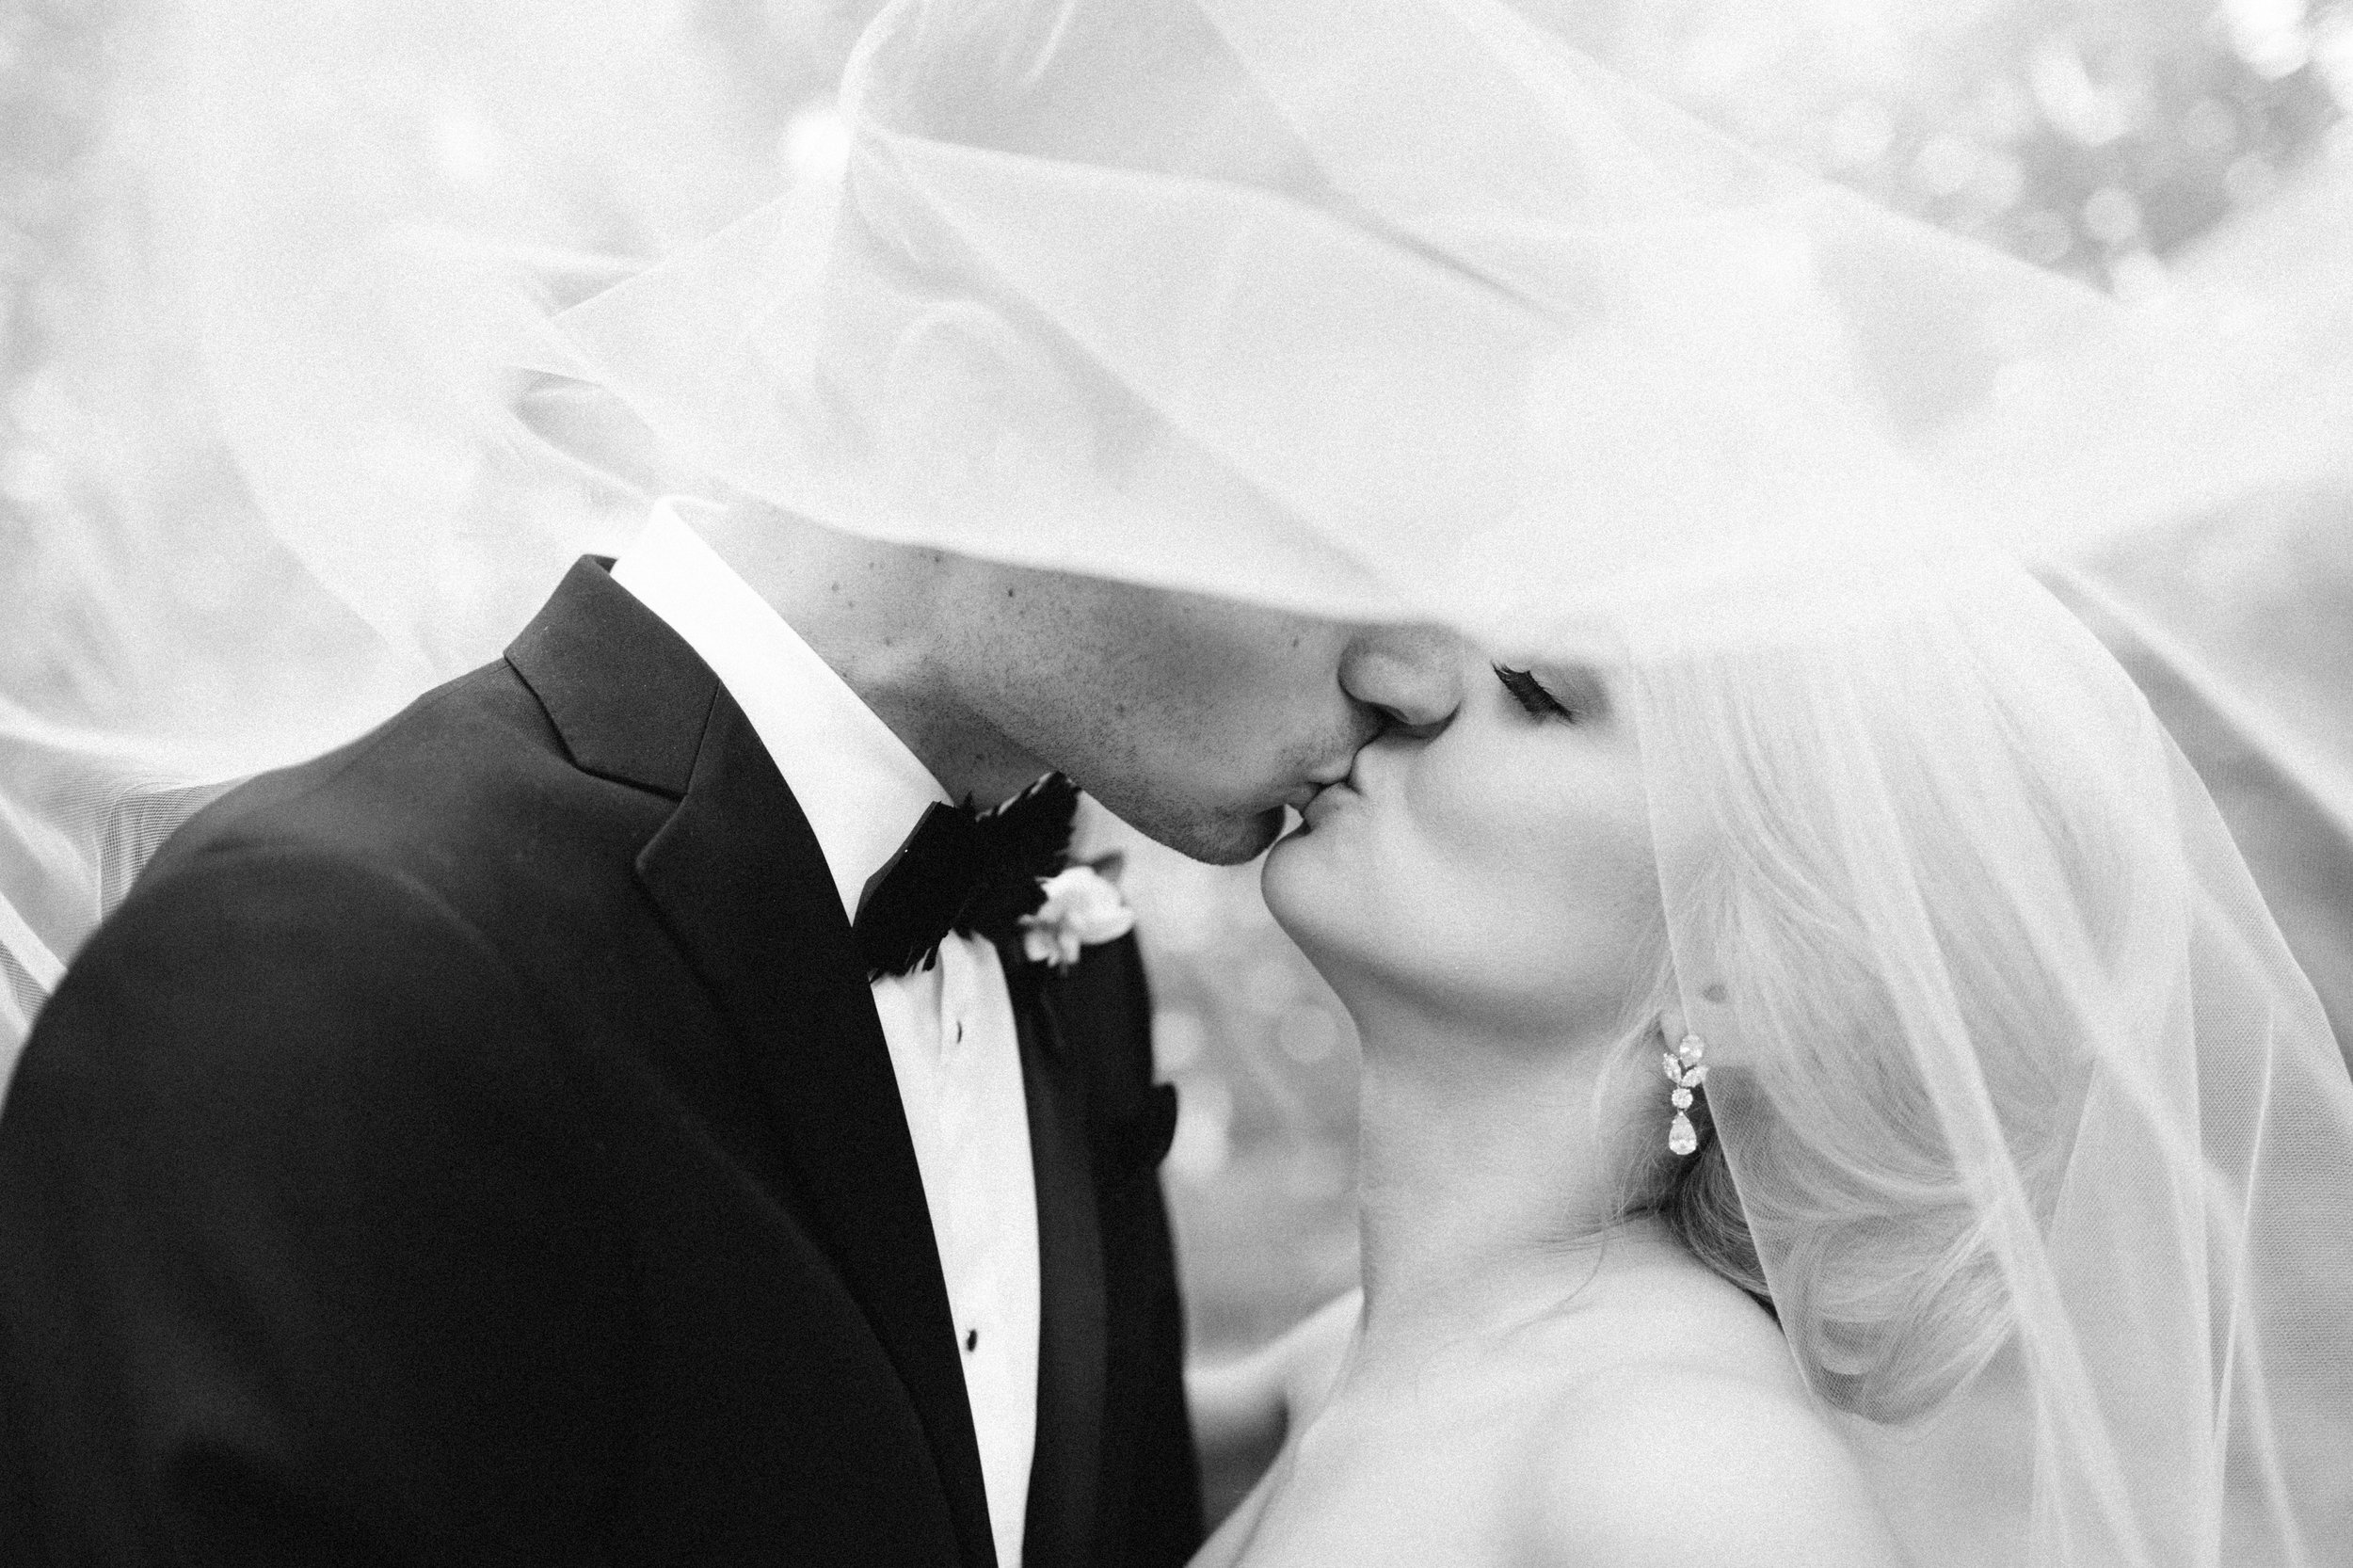 Marie_Perry_Duke_Mansion_Wedding_Charlotte_NC_Abigail_Malone_Photography-497.jpg